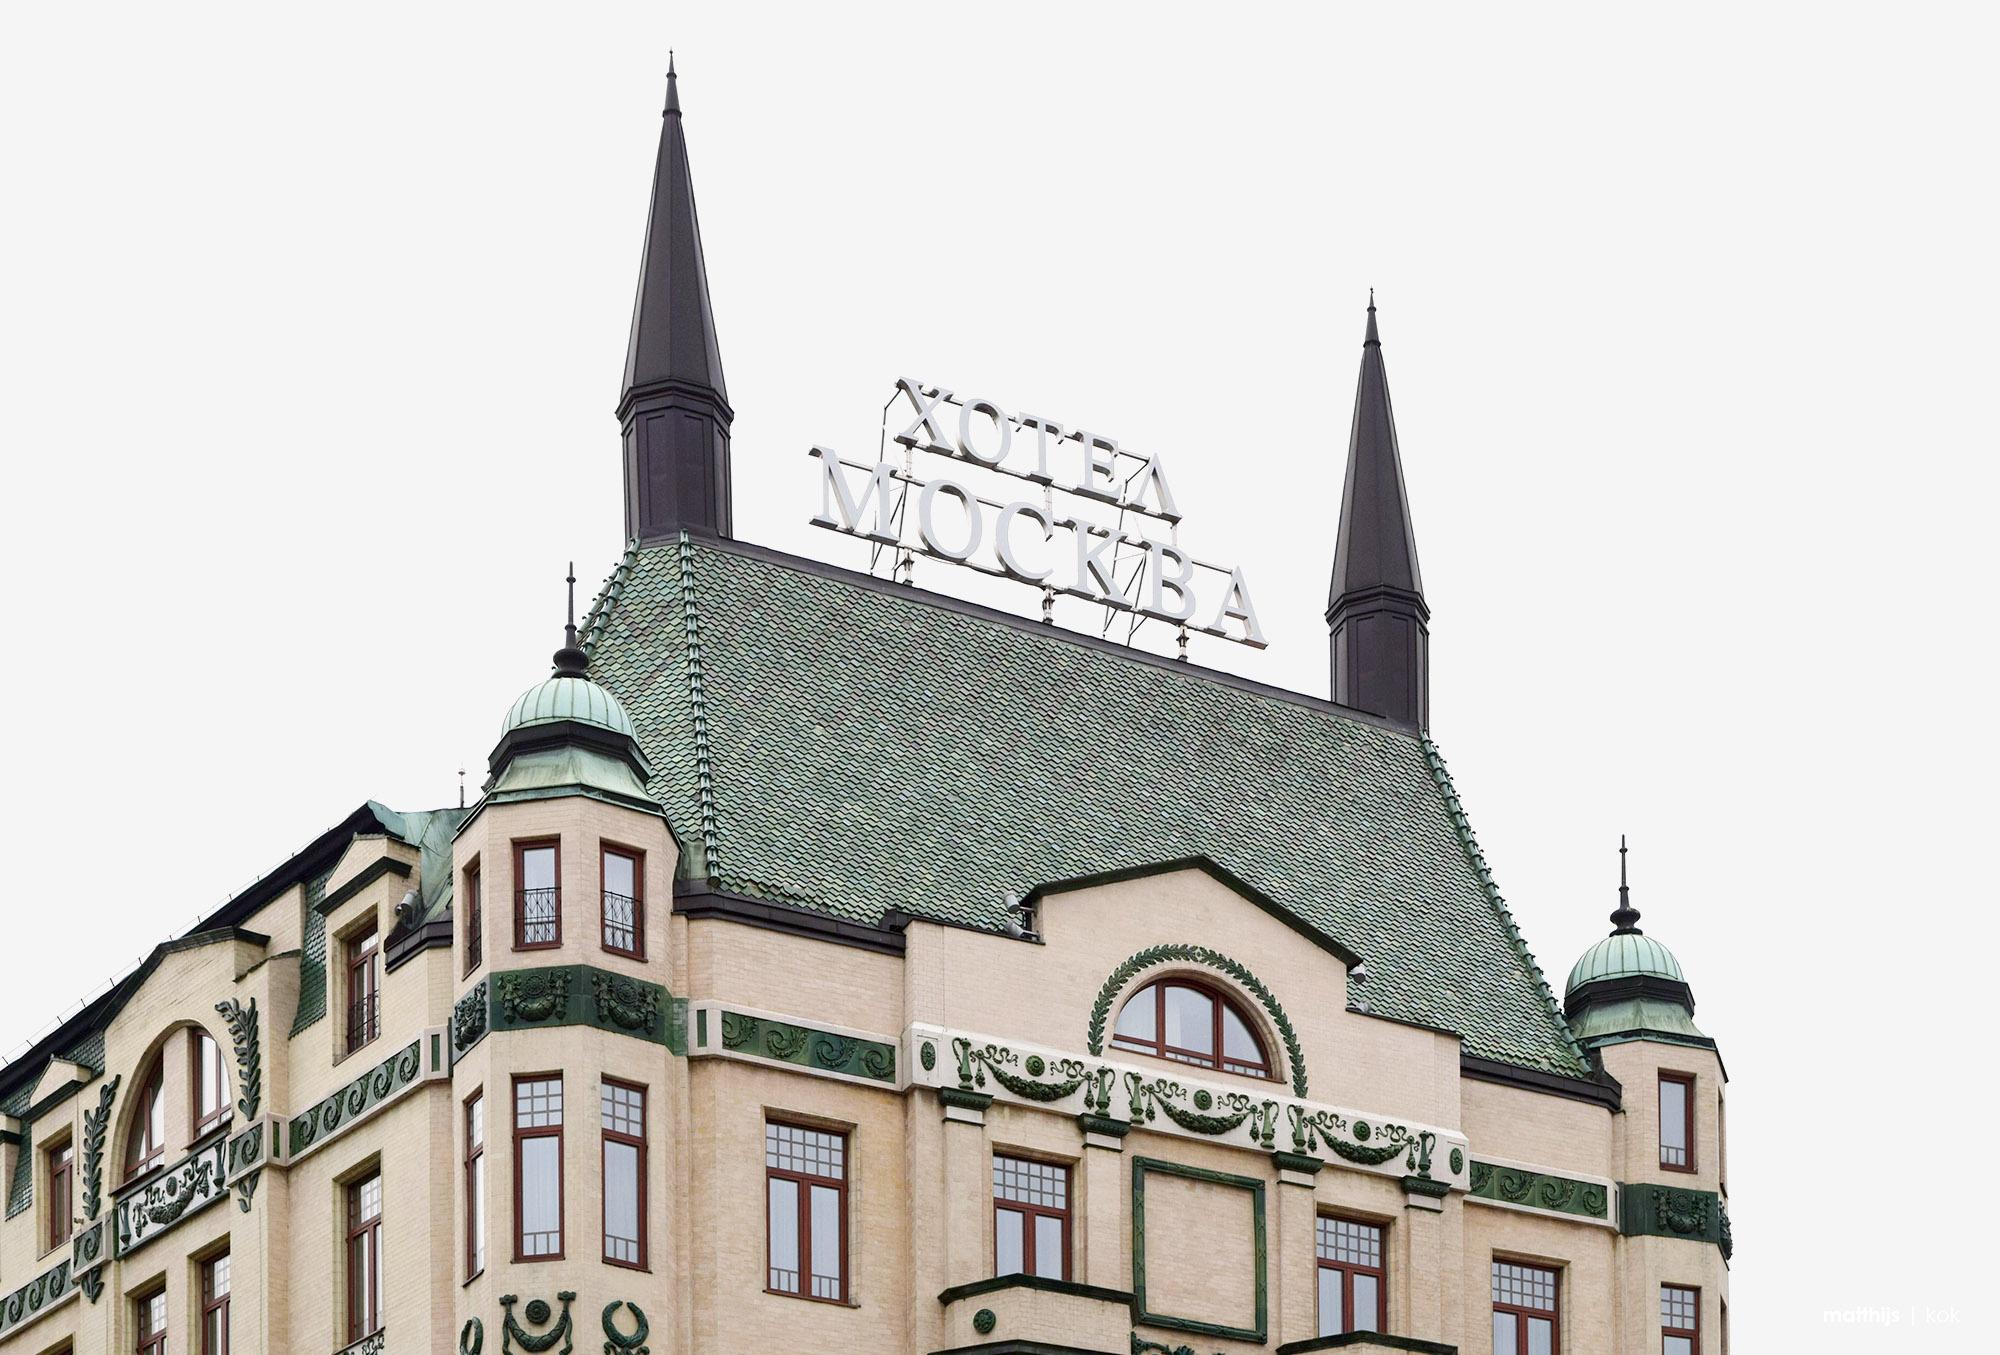 Hotel Moskva, Belgrade, Serbia   Photo by Matthijs Kok